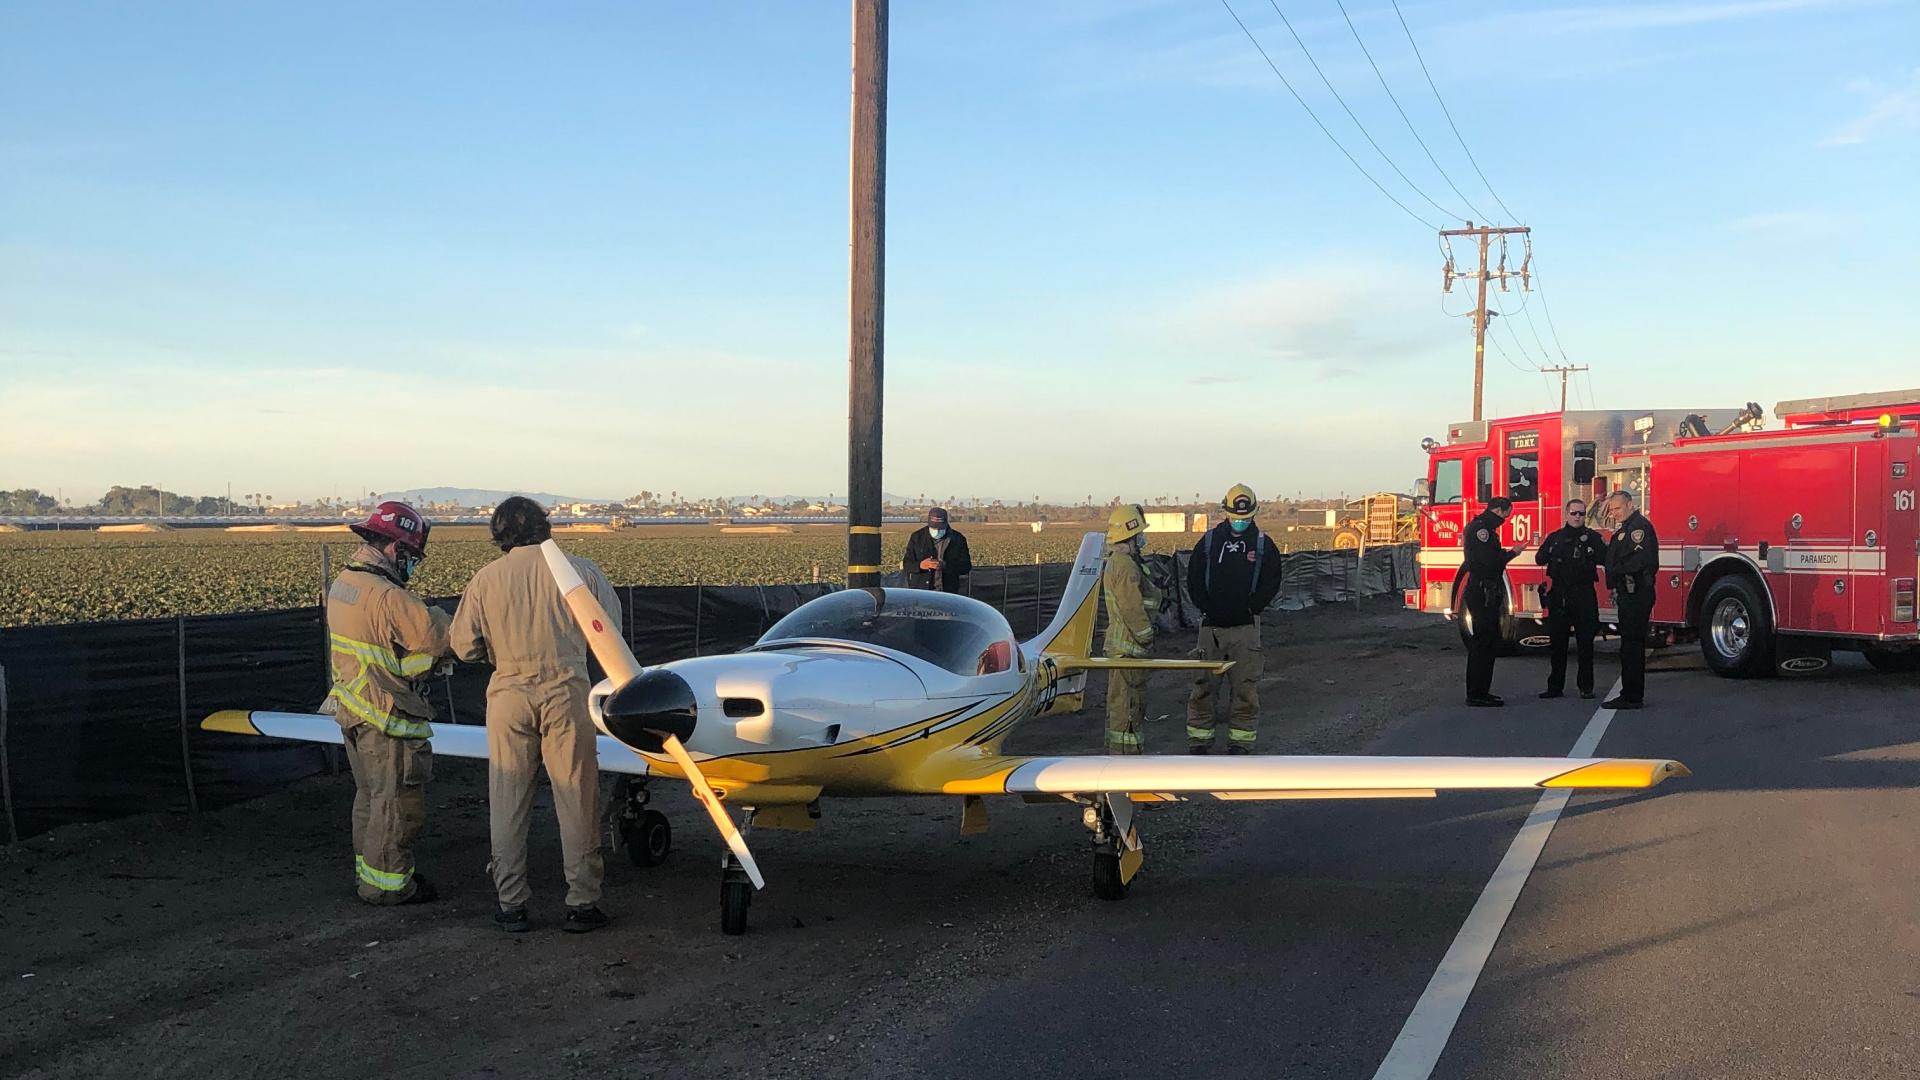 A single-engine Lancair that made an emergency landing near Oxnard Airport on Jan. 10, 2021. (Oxnard Police Department)